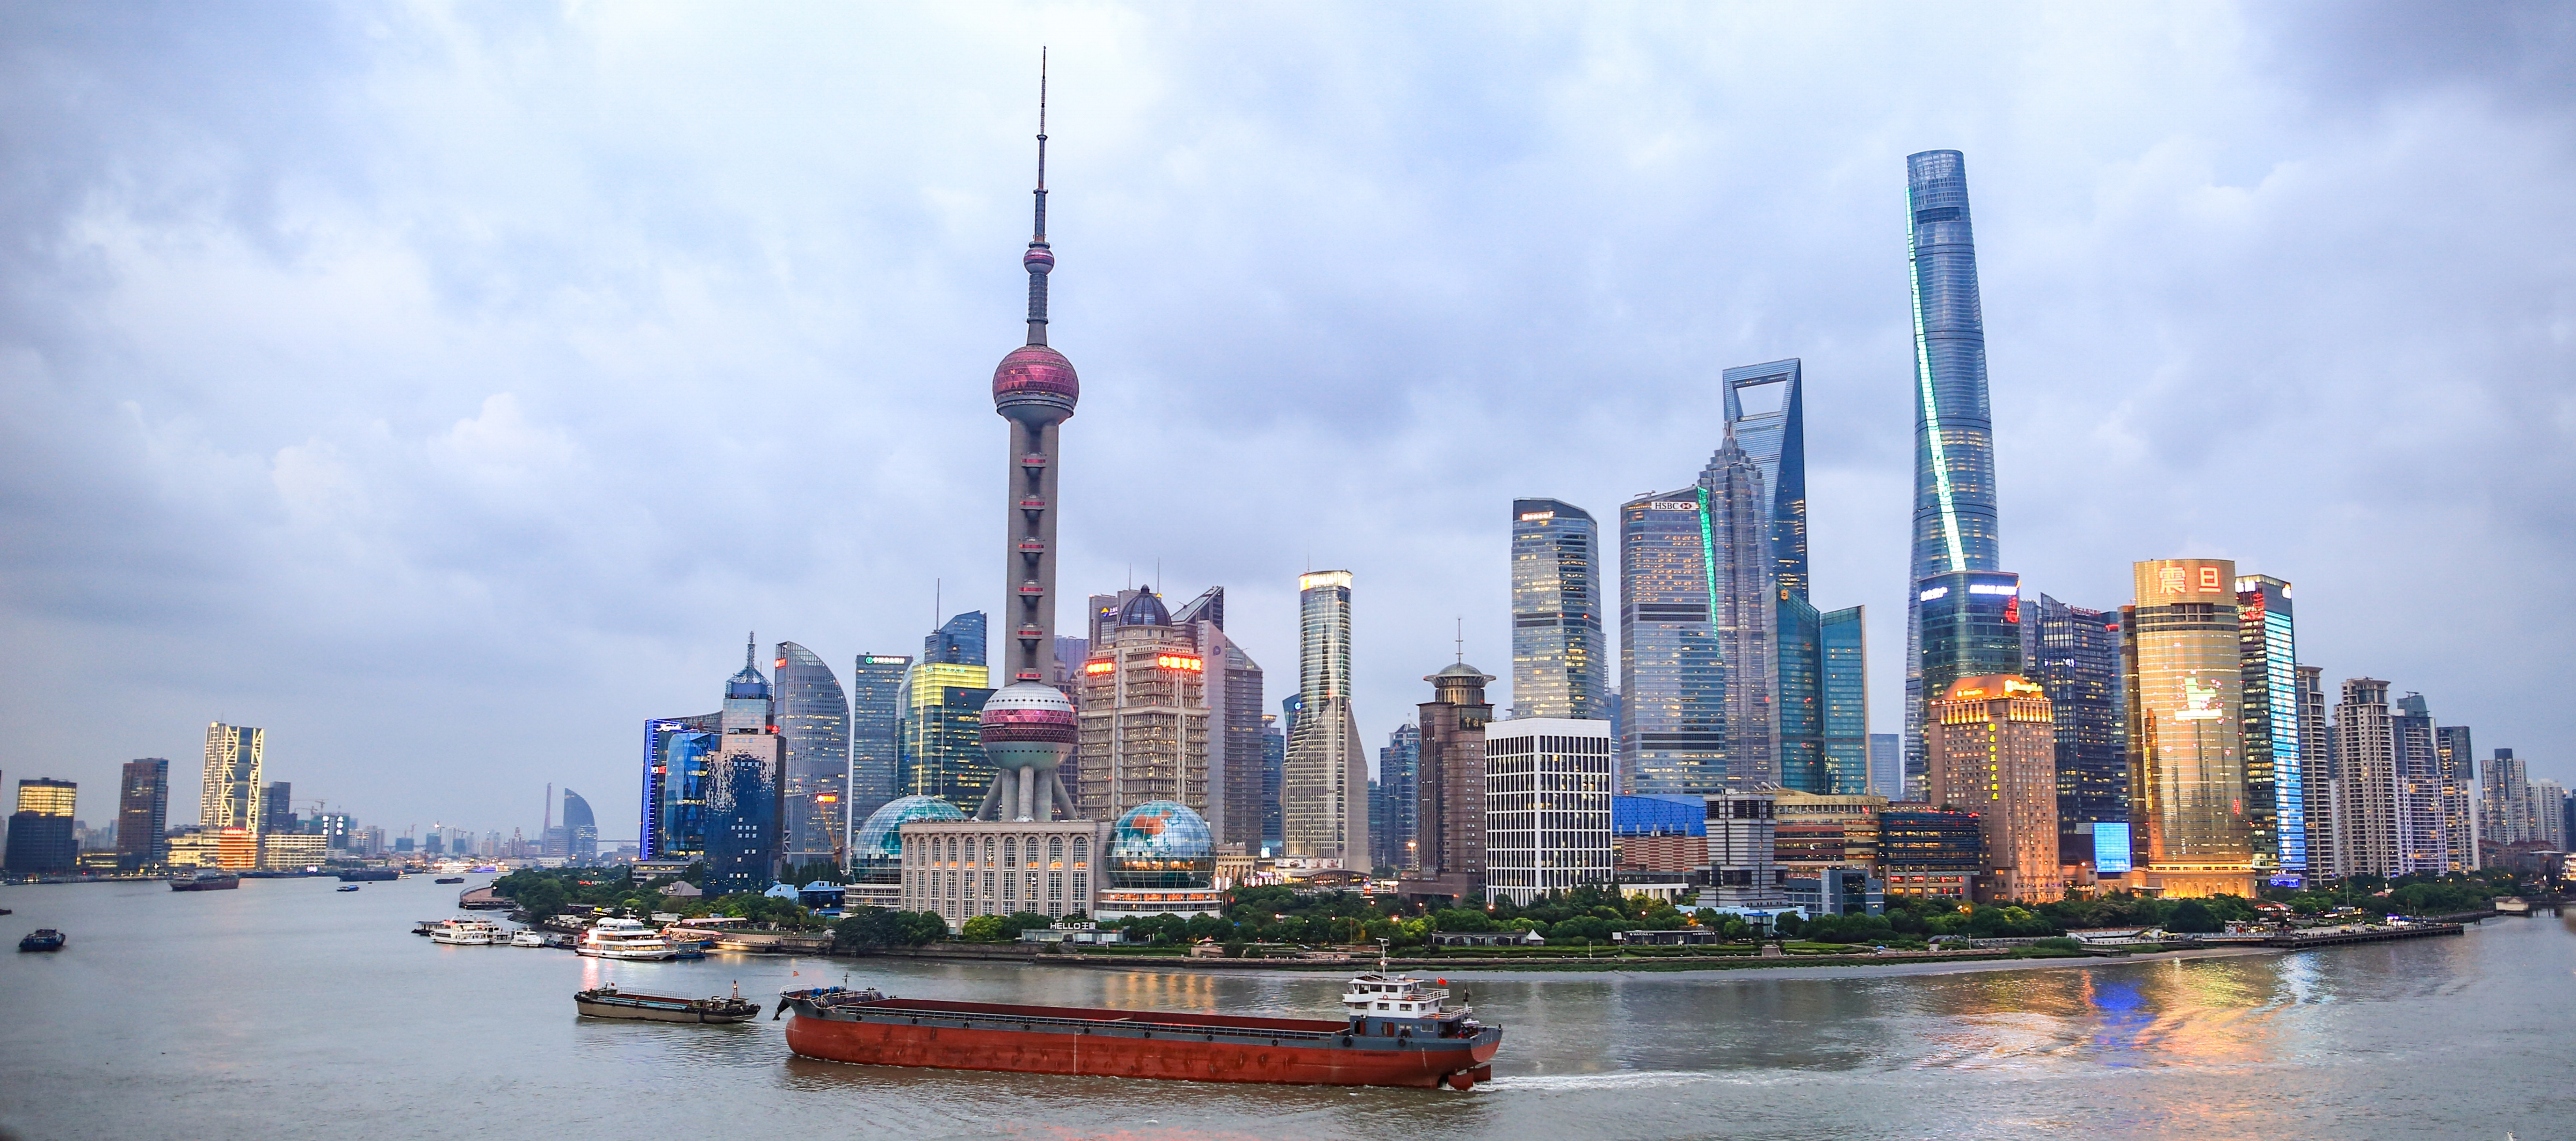 Web2Asia: China Digital Online Marketing Agency